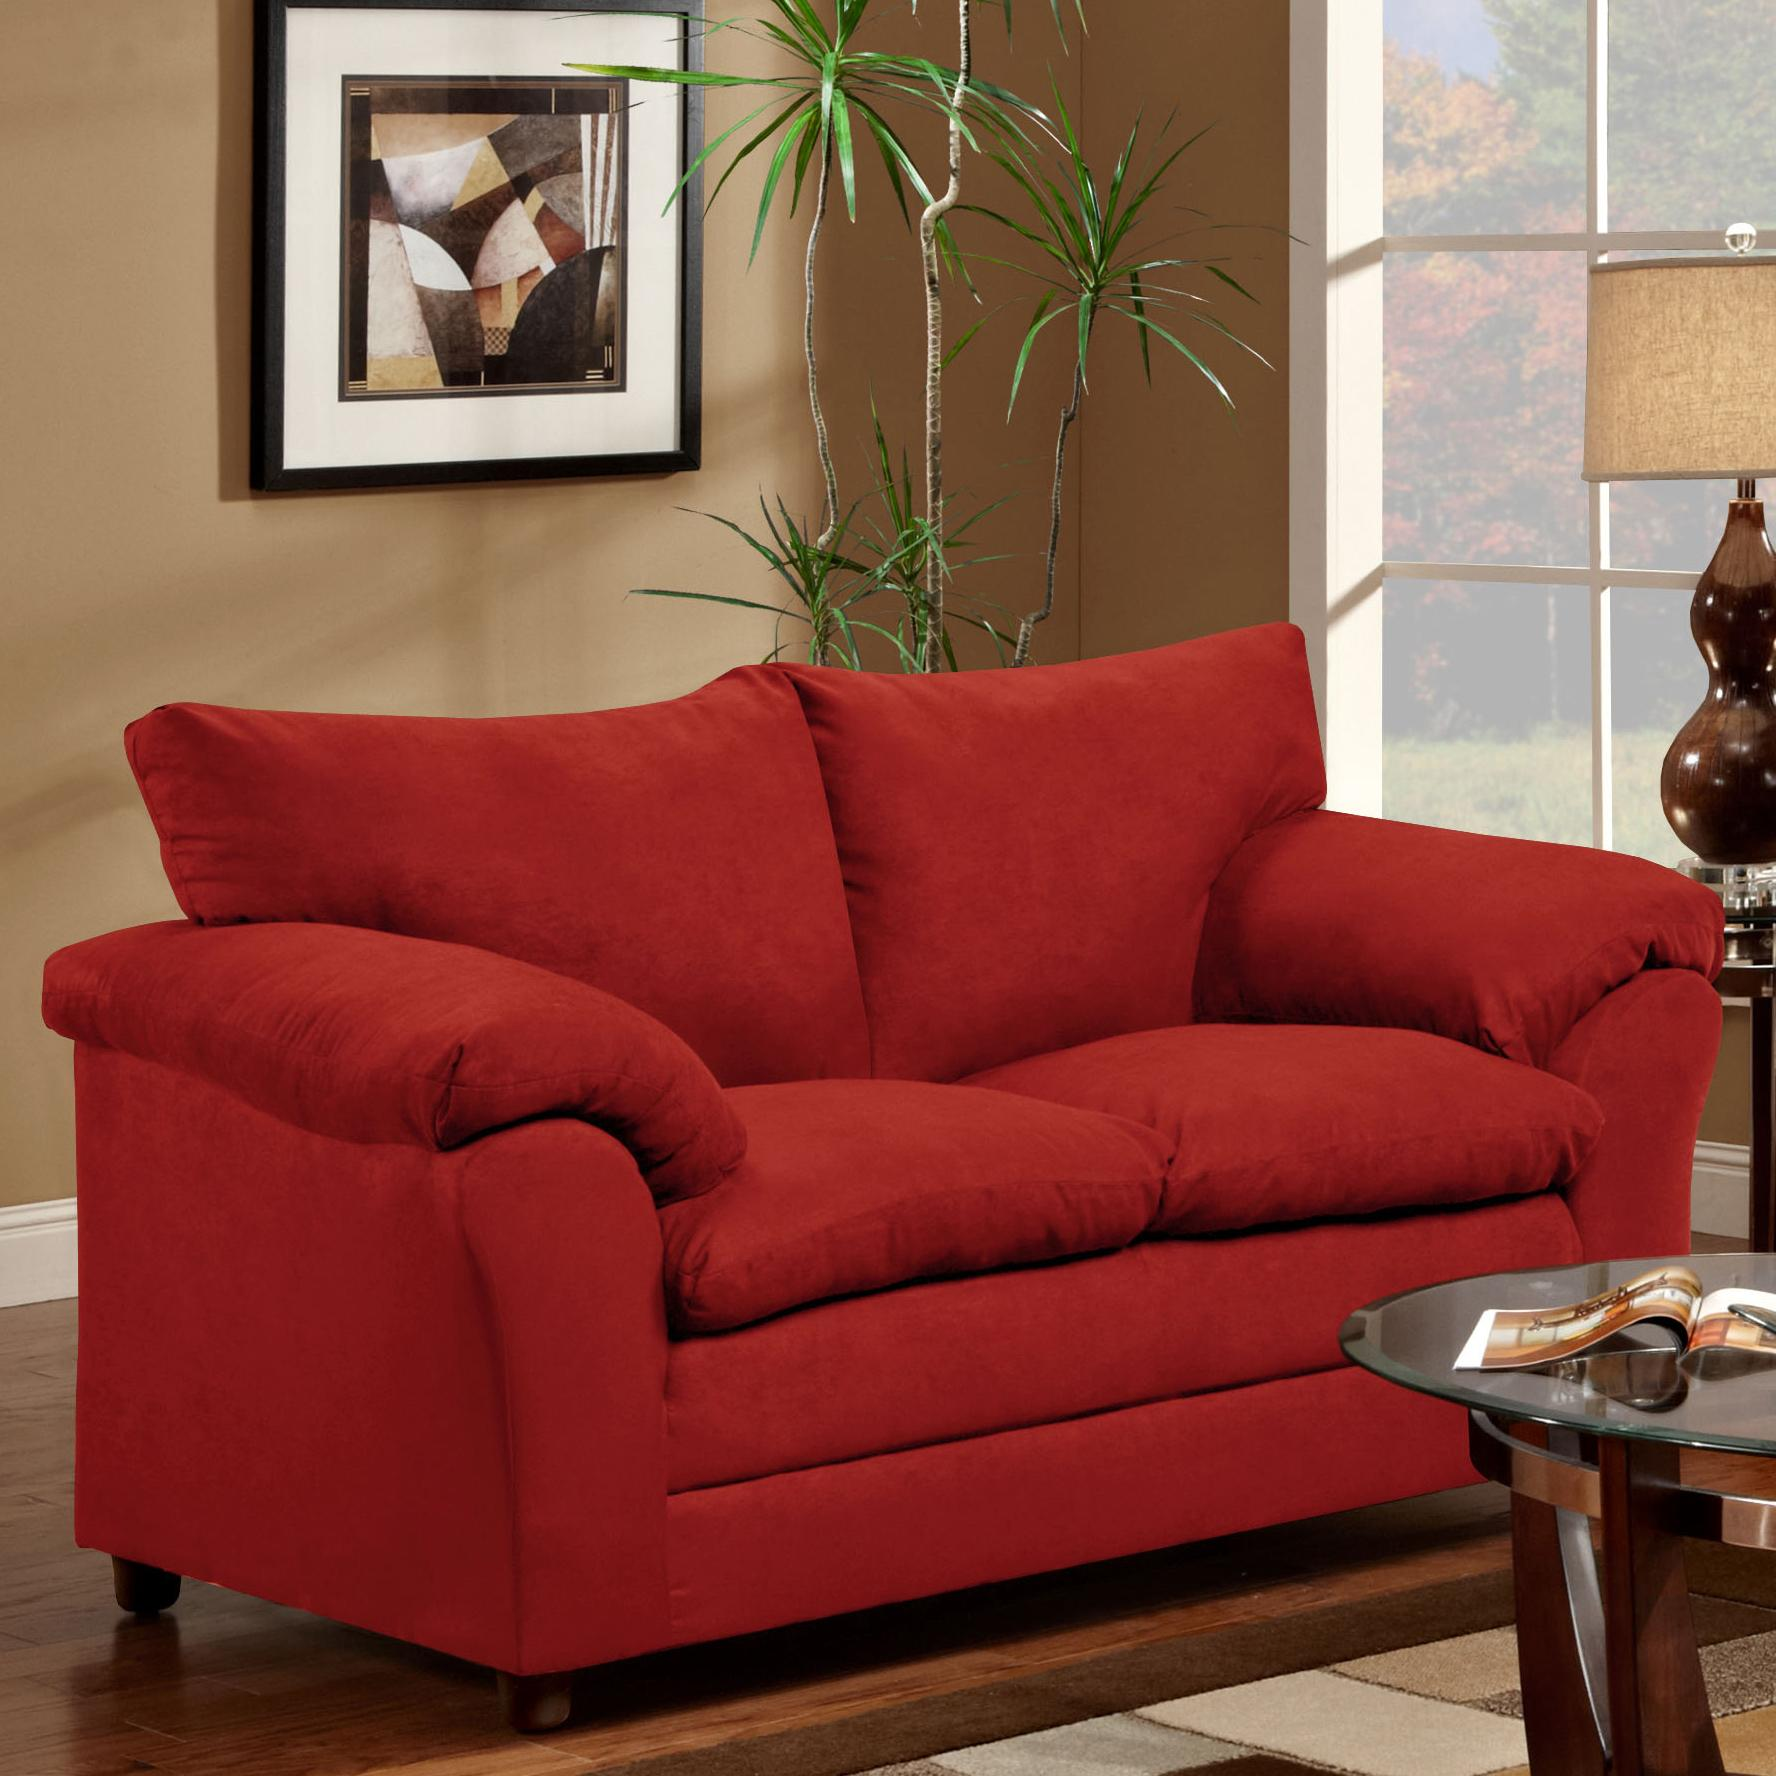 1150 Loveseat by Washington Furniture at Lynn's Furniture & Mattress